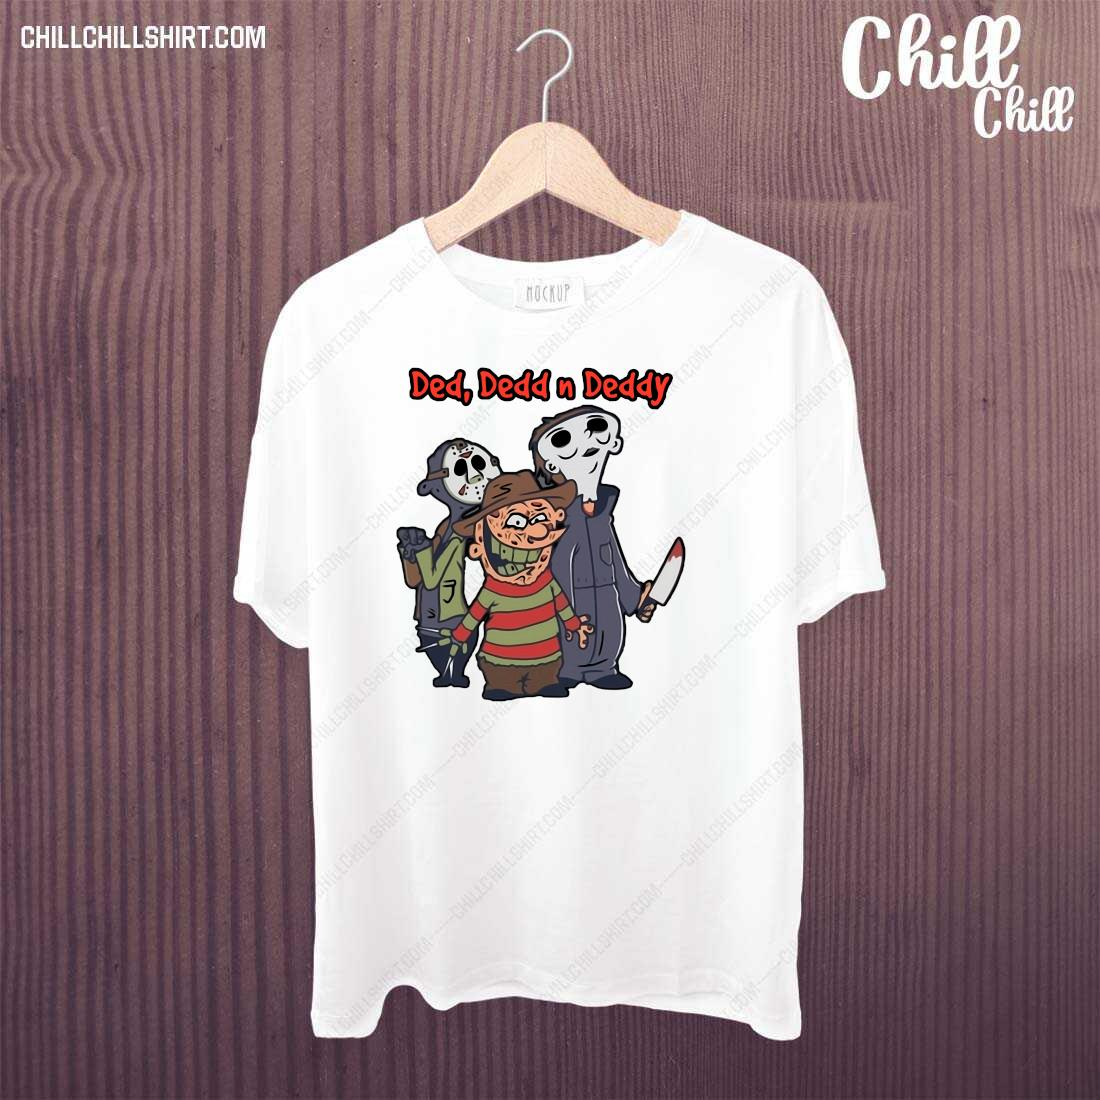 Horror Characters Halloween Ded Dedd N Deddy Shirt